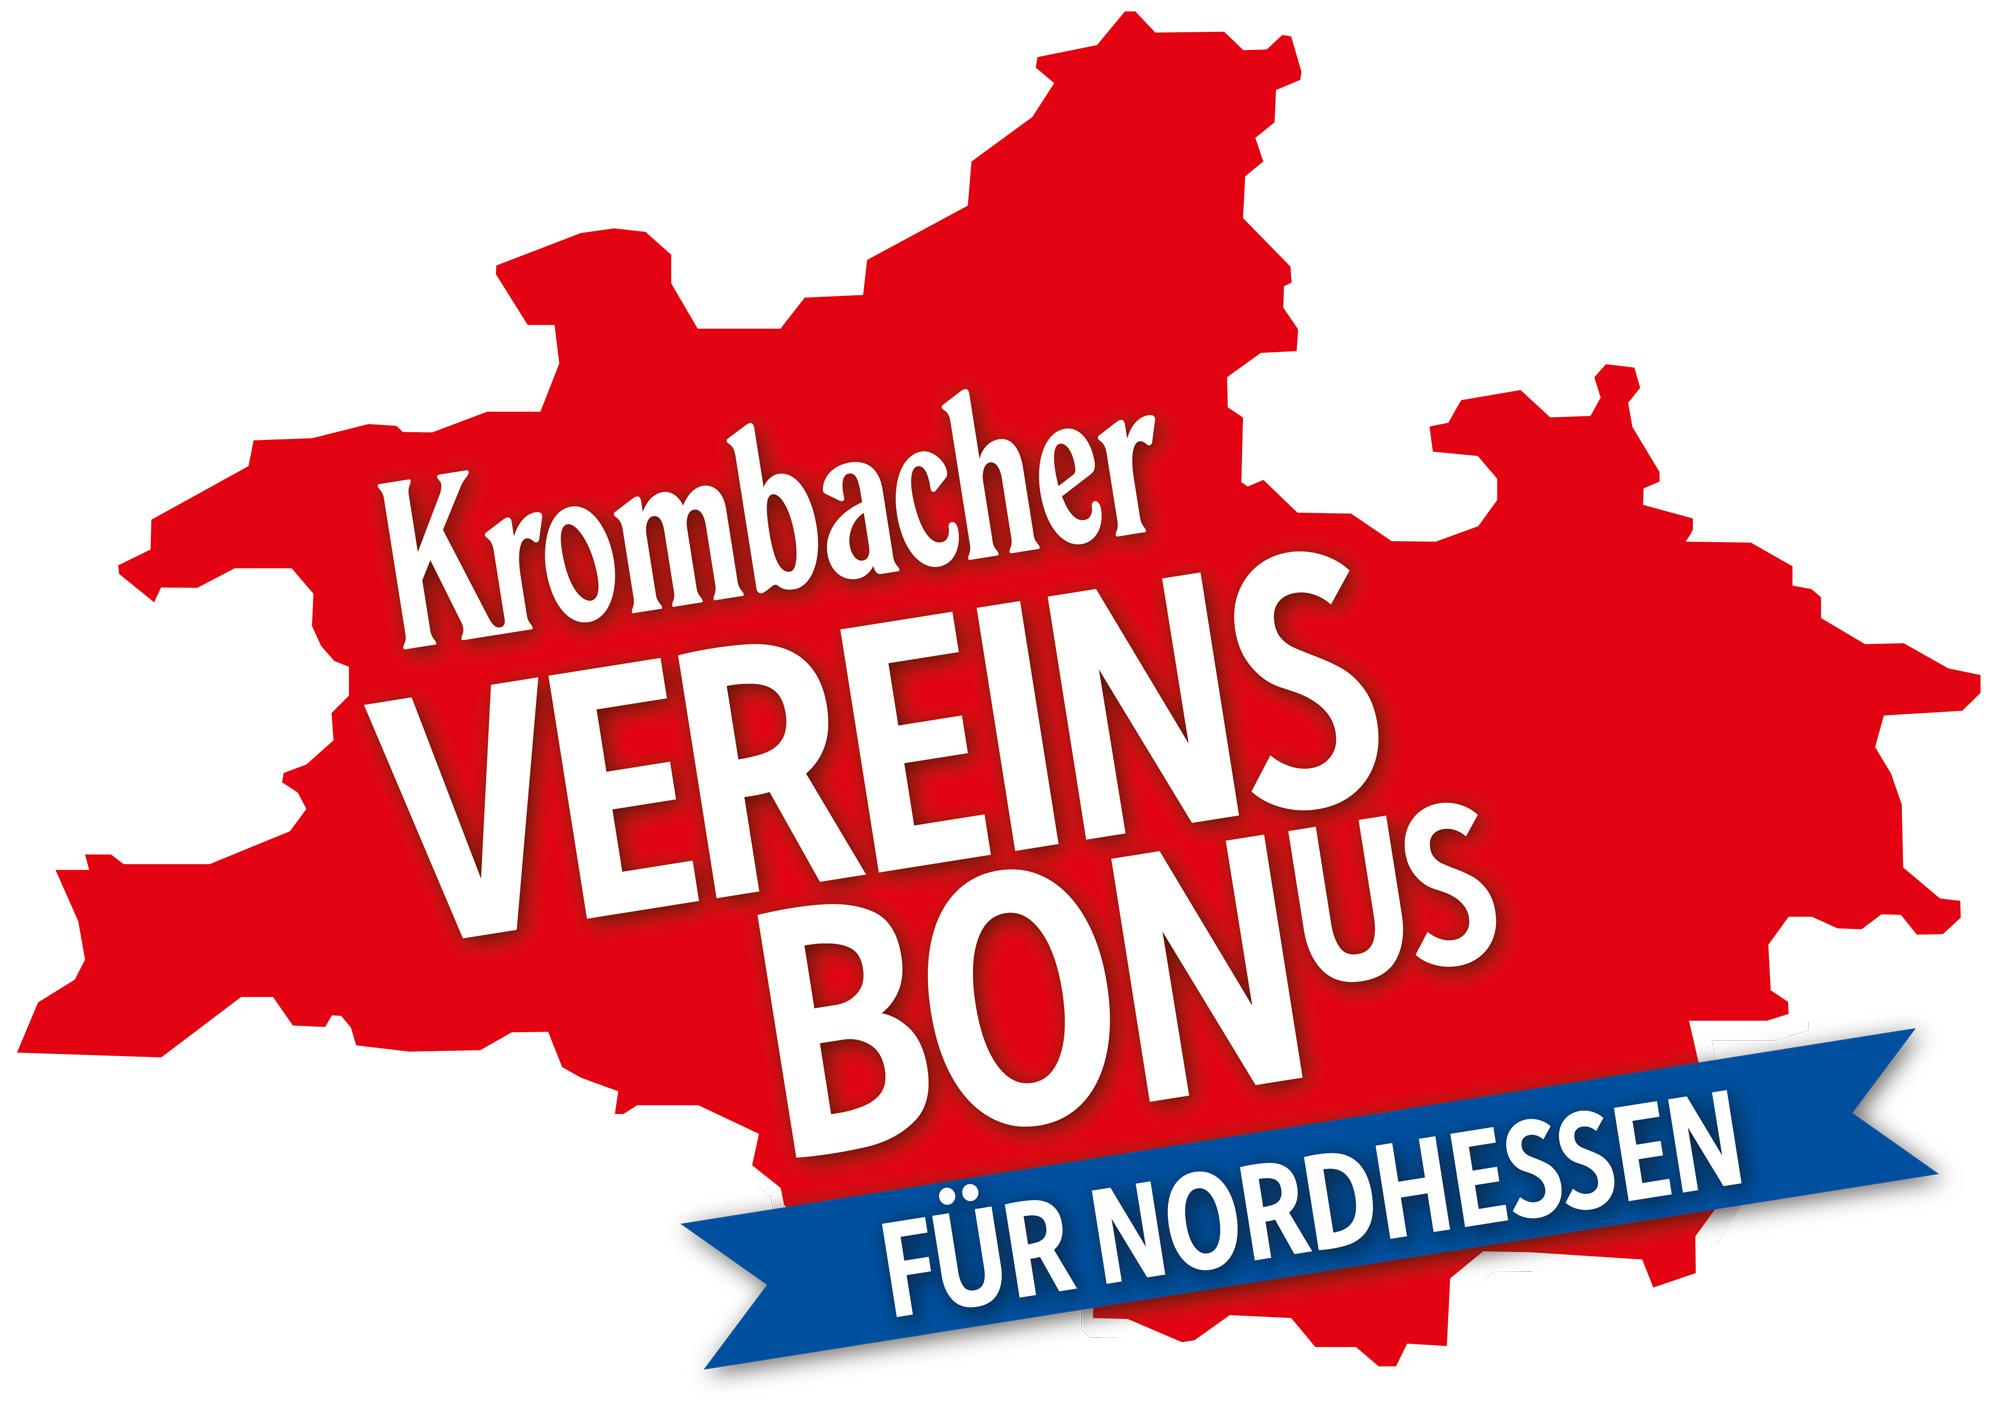 Krombacher VereinsBONus